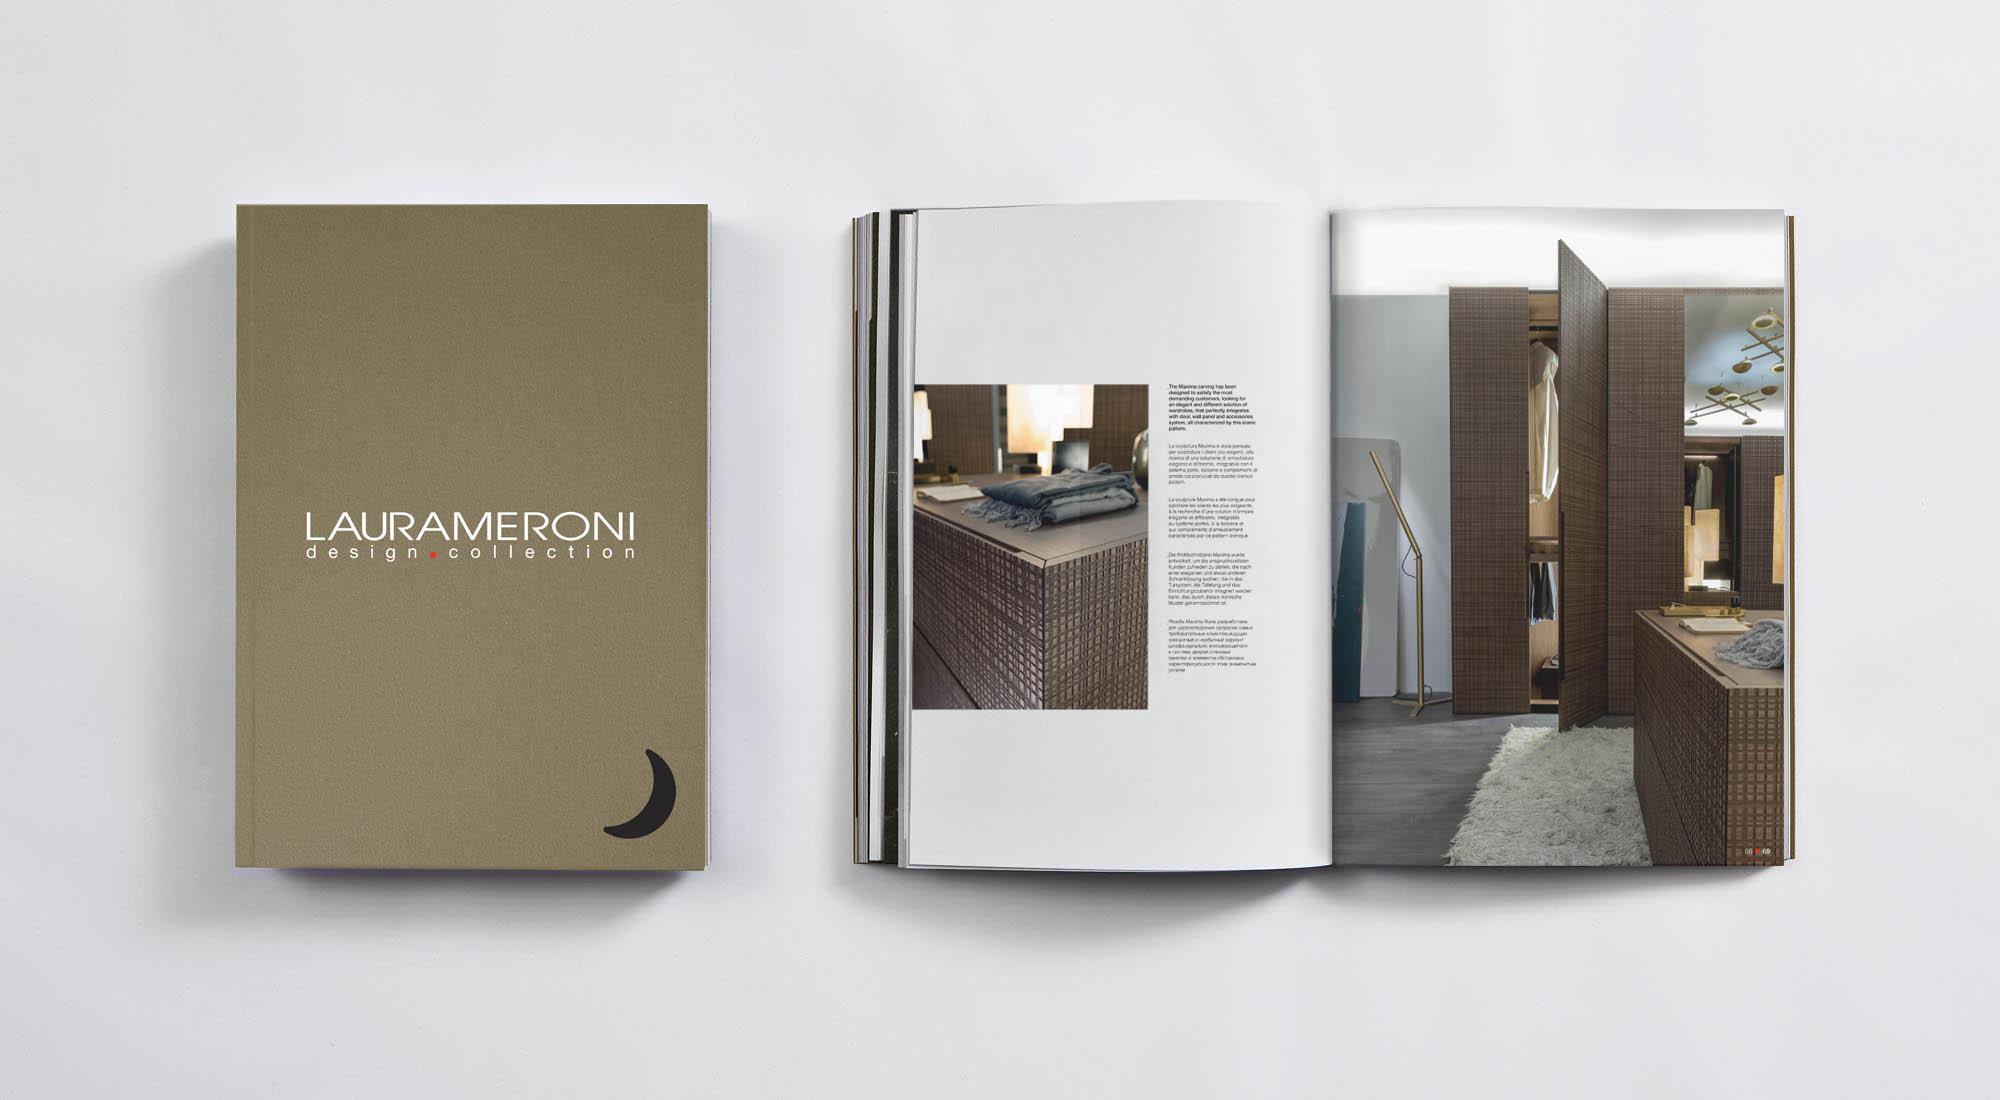 laurameroni luxury night bedroom furniture catalogue